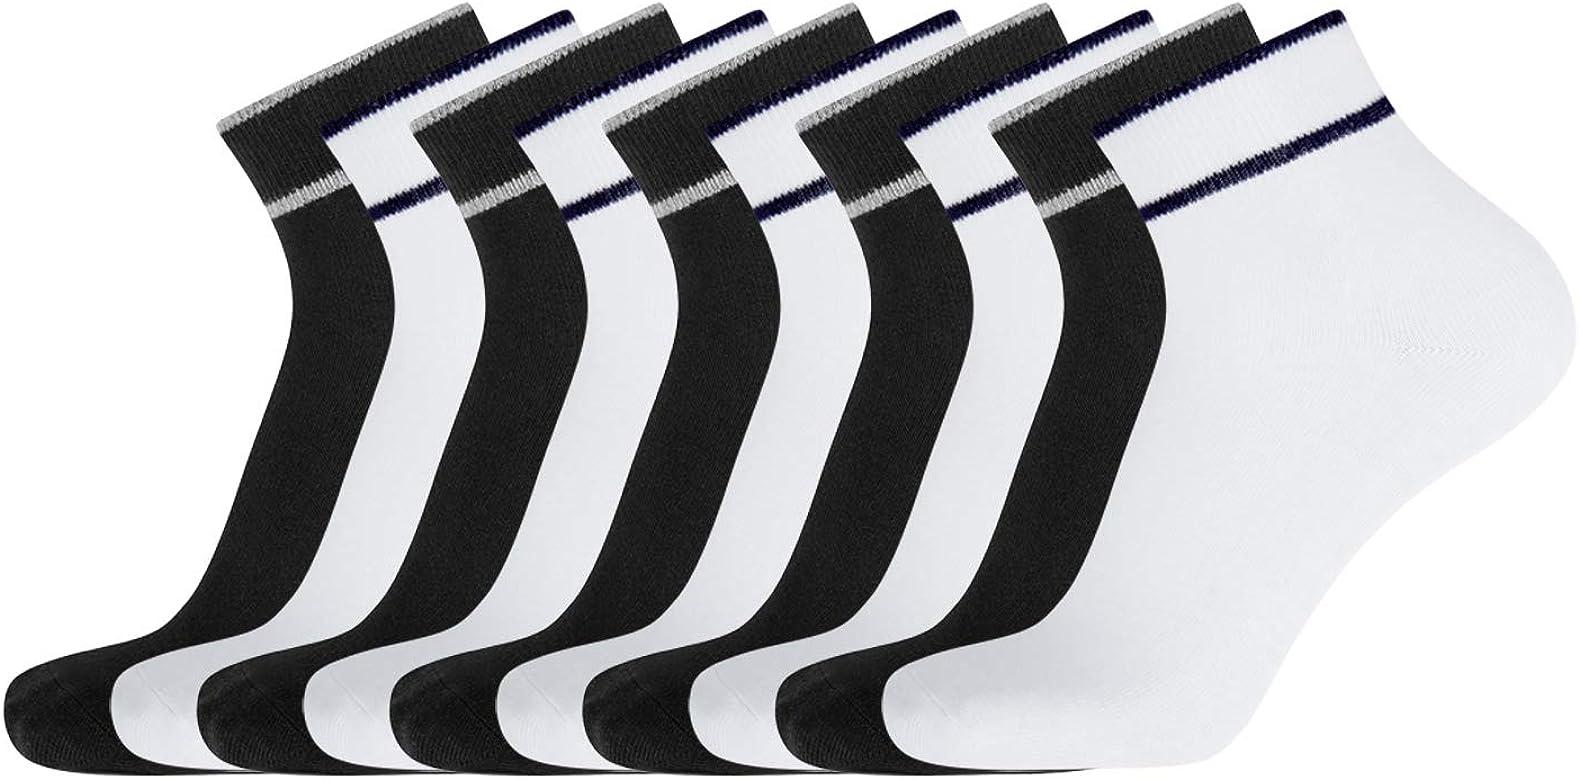 oodji Ultra Hombre Calcetines Deportivos (Pack de 10), Multicolor ...